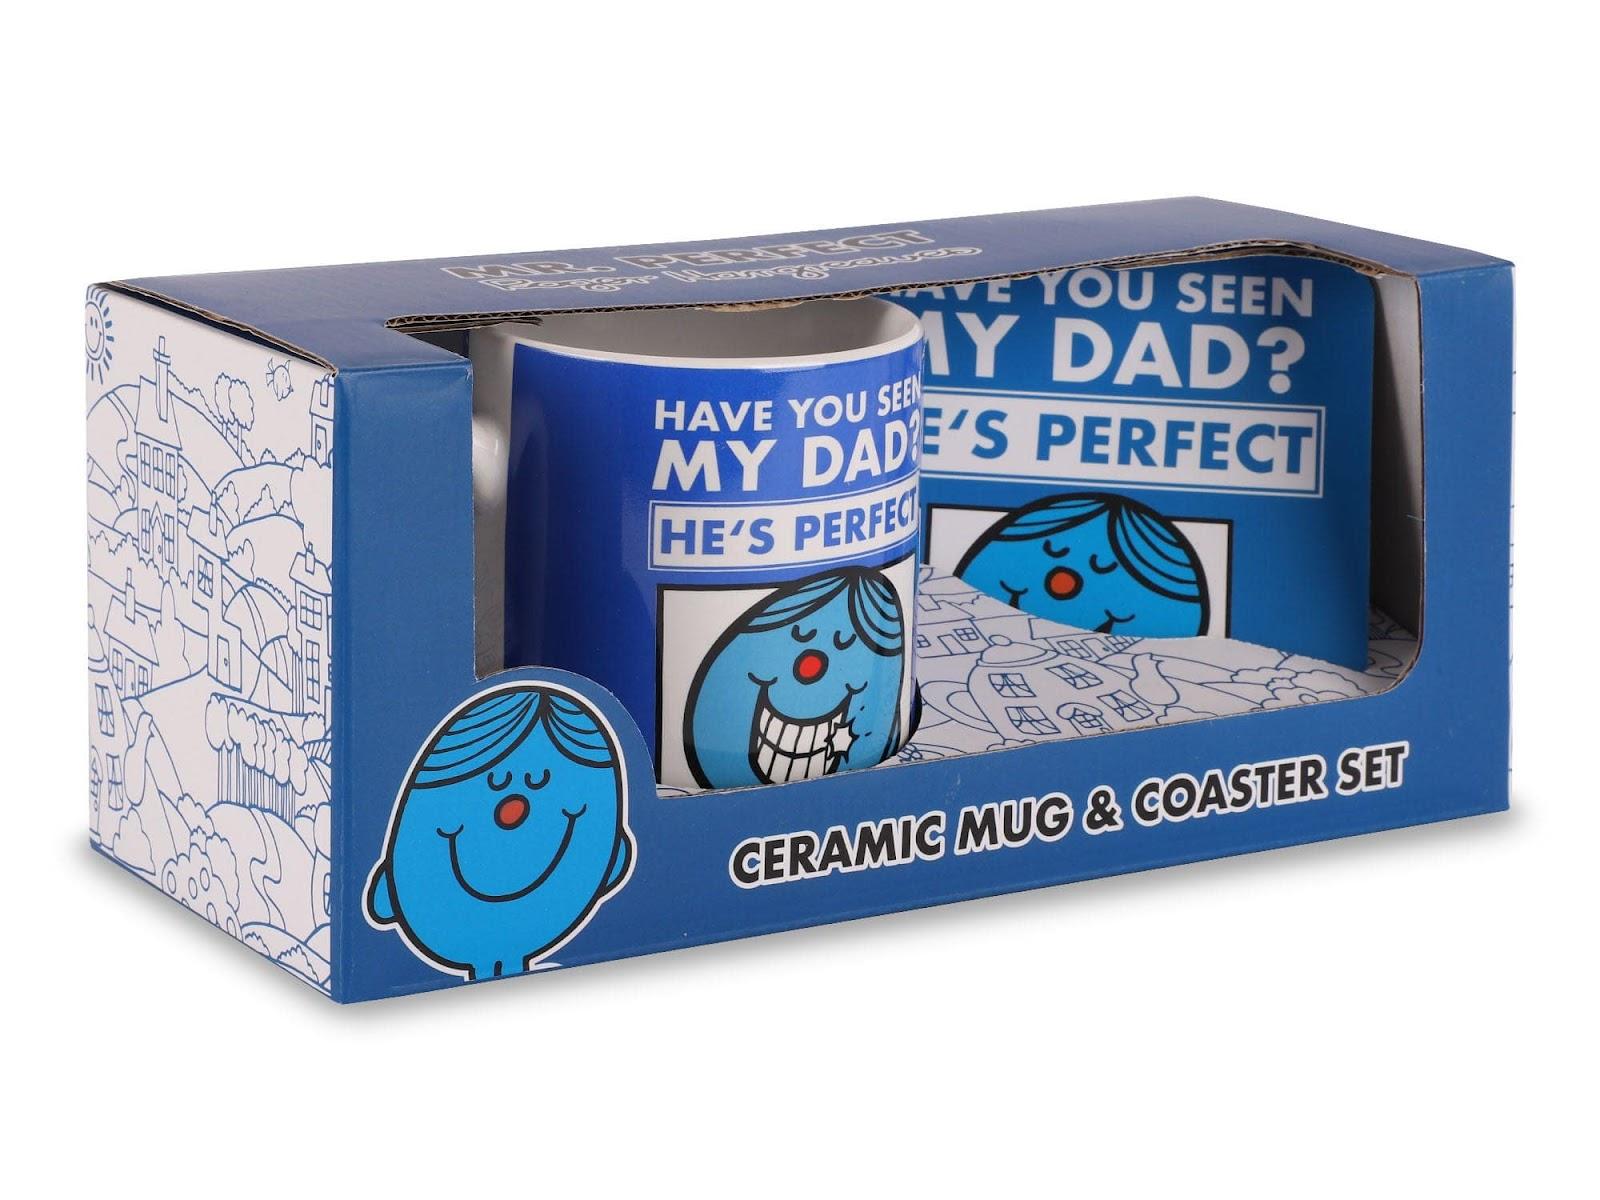 Mr Perfect fathers dad mug and coaster